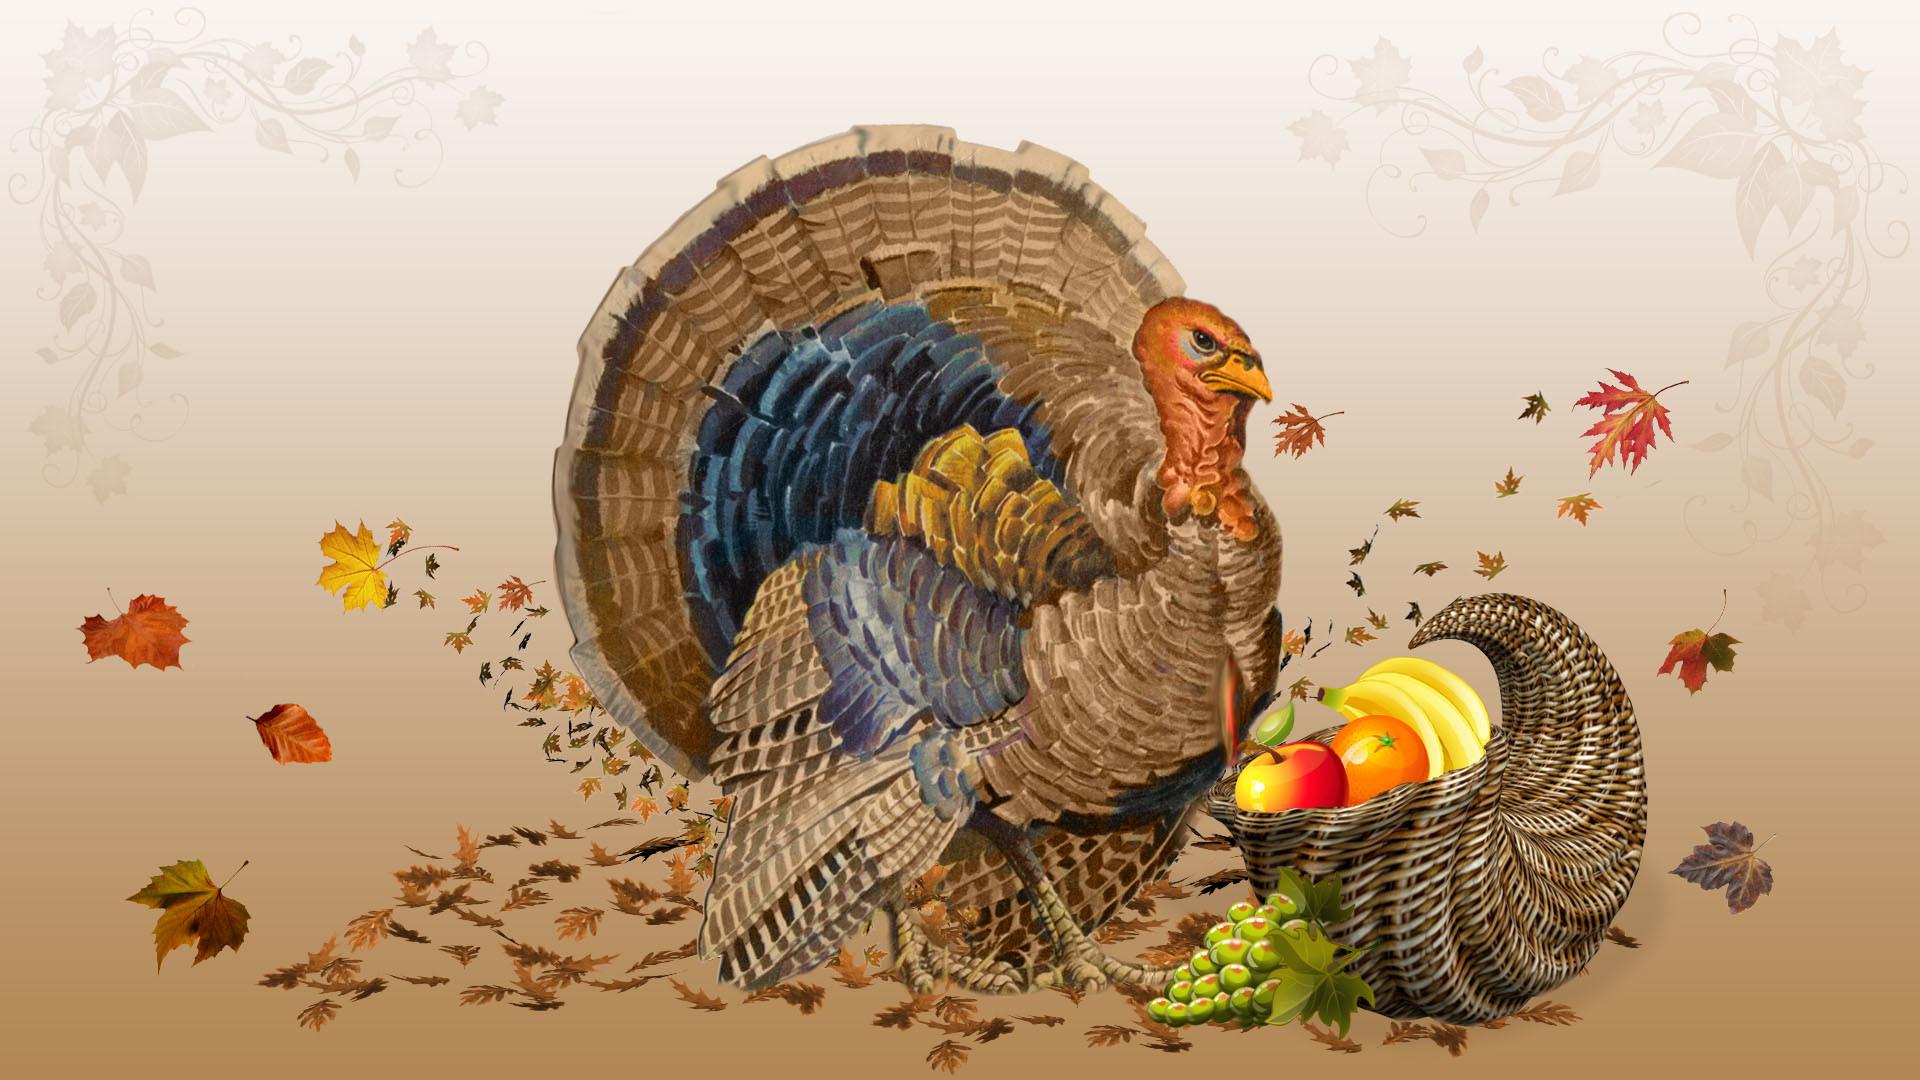 Happy thanksgiving 2012 turkey Wallpaper HD